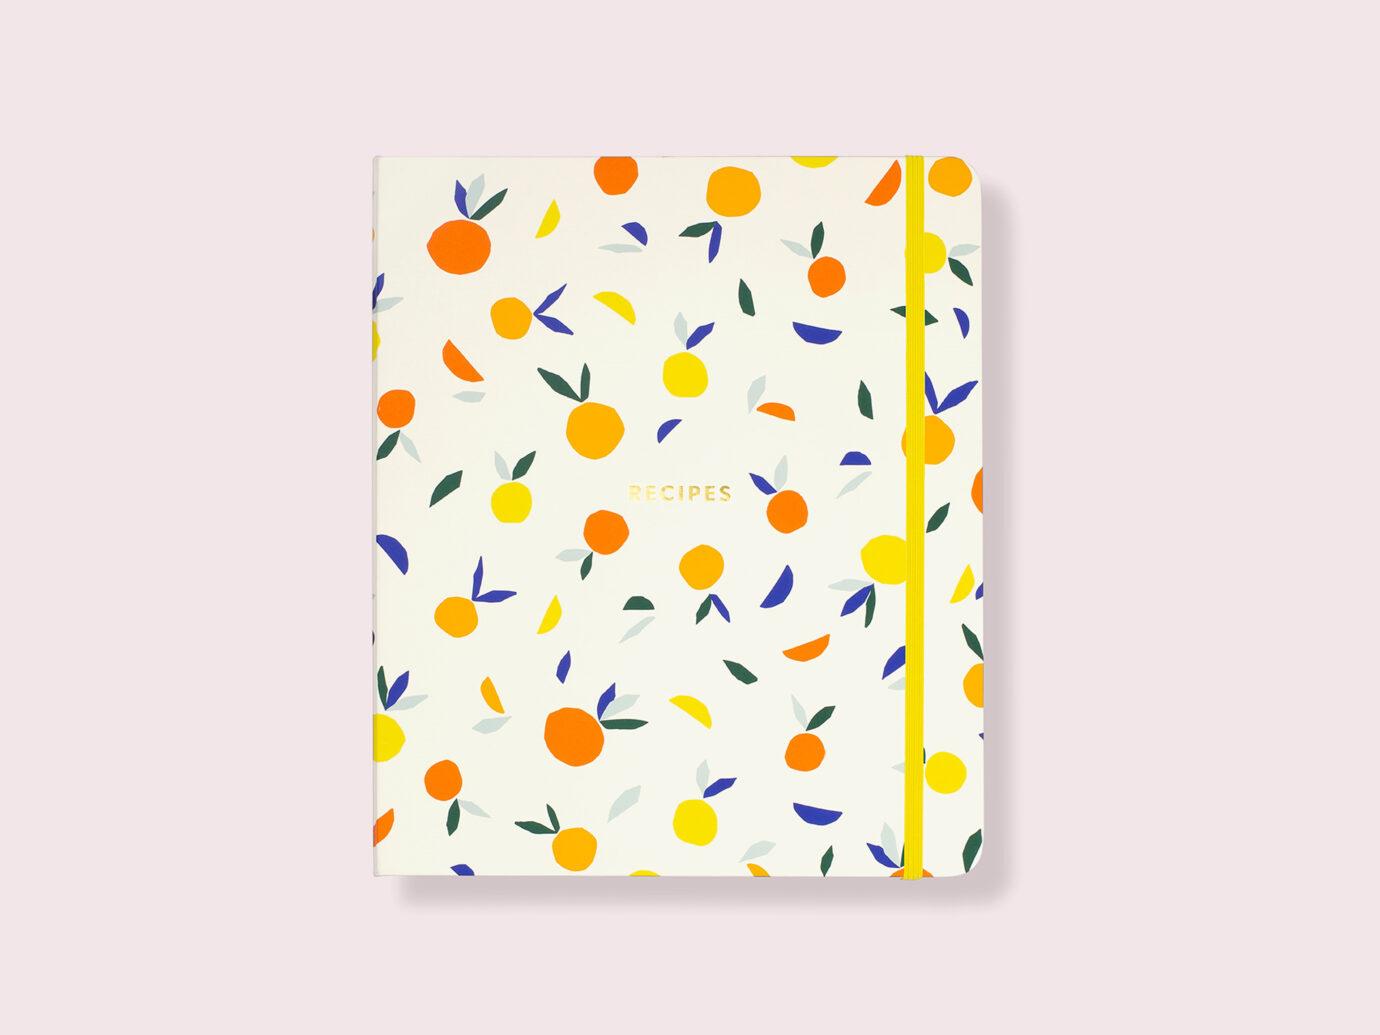 Kate Spade Recipe Notebook